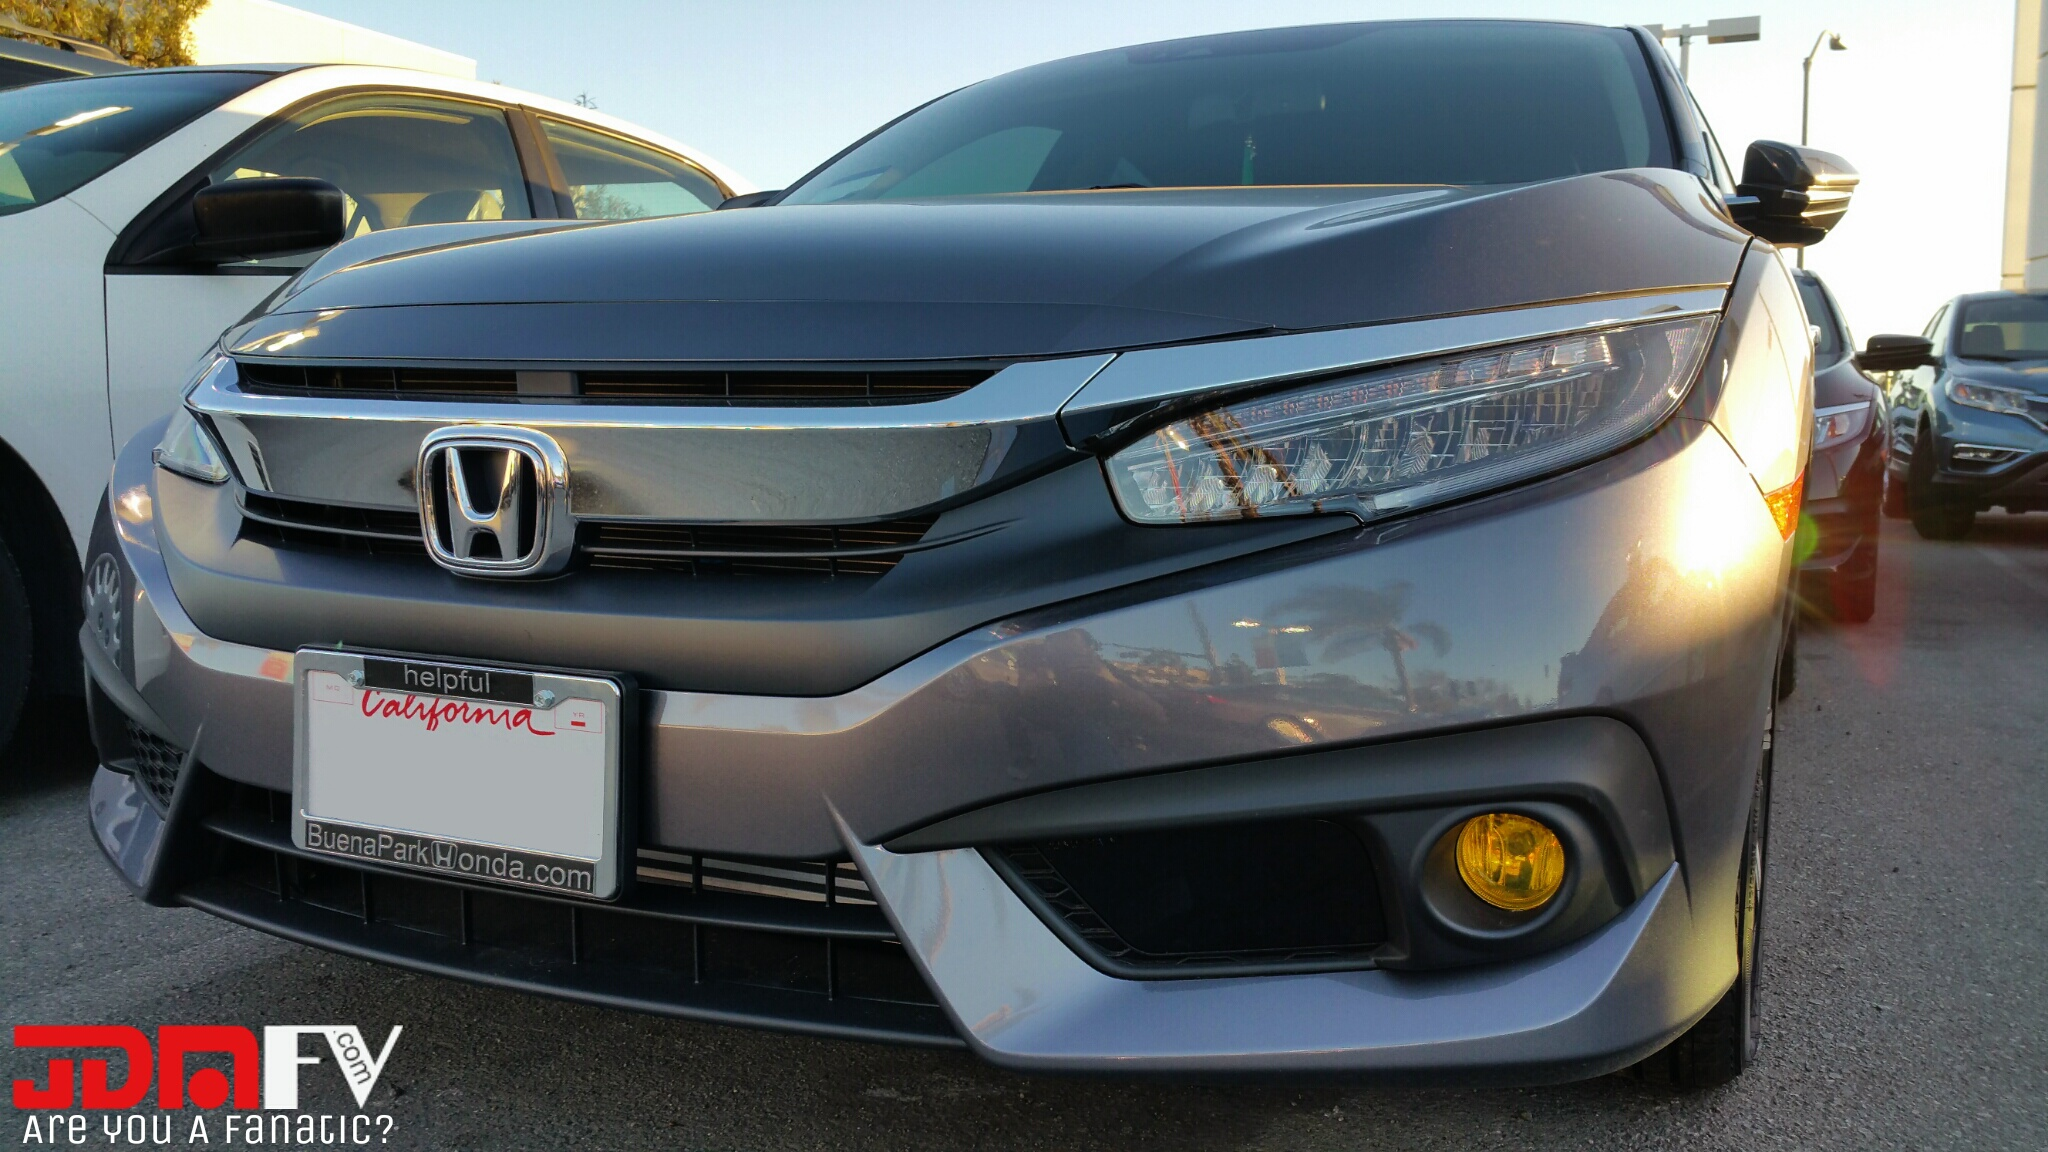 l civic cars sale for honda tl pic cargurus used ex